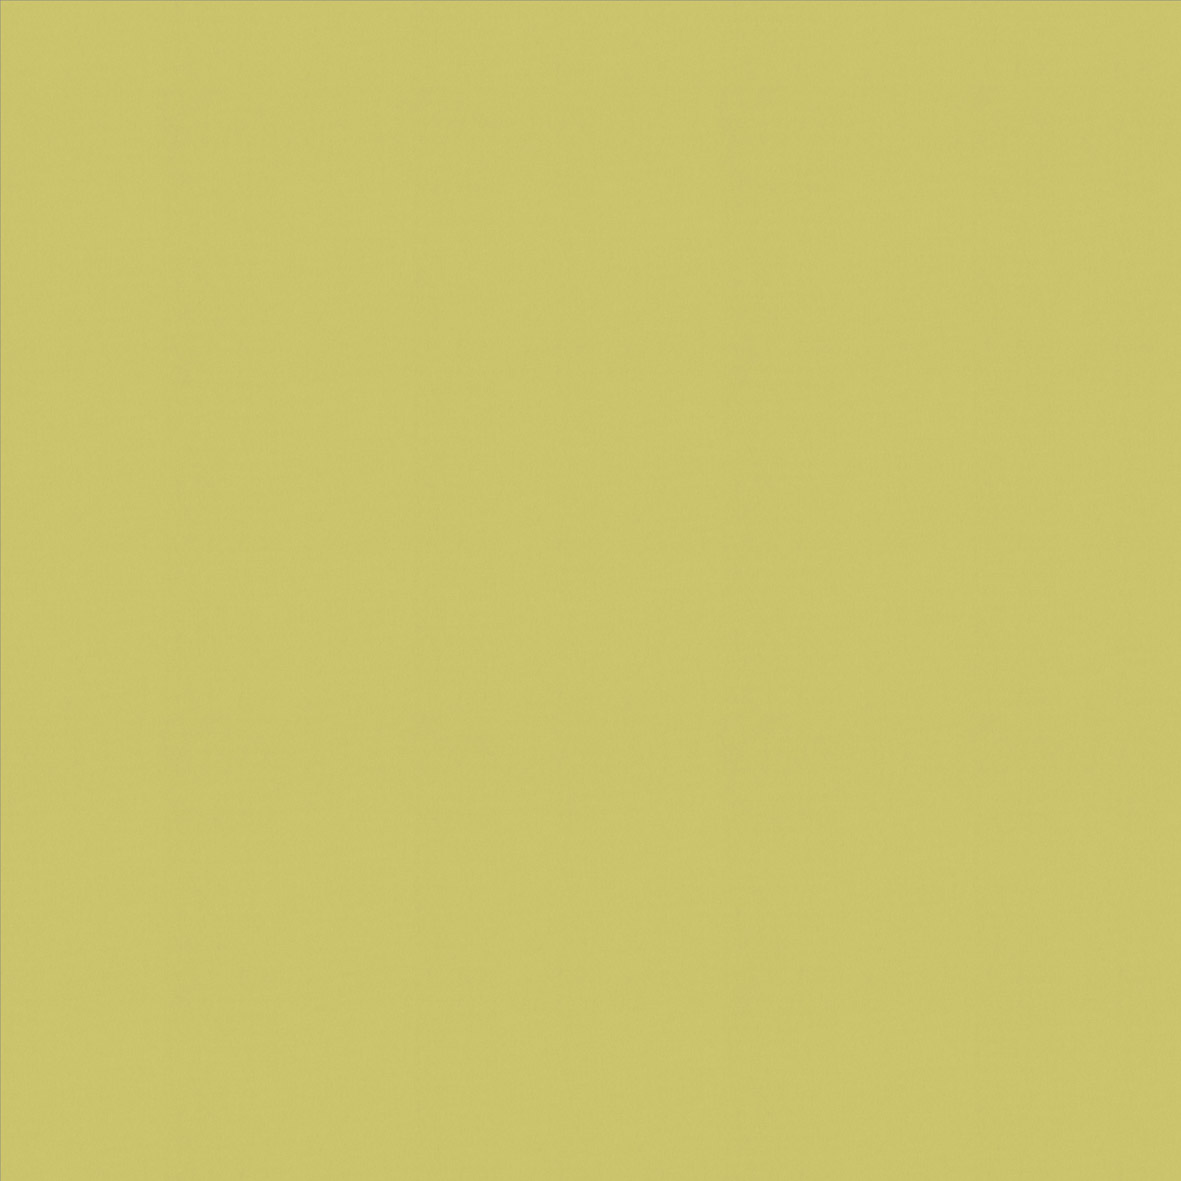 Roller_Swatch_Palette_Fresh Apple_RE0056